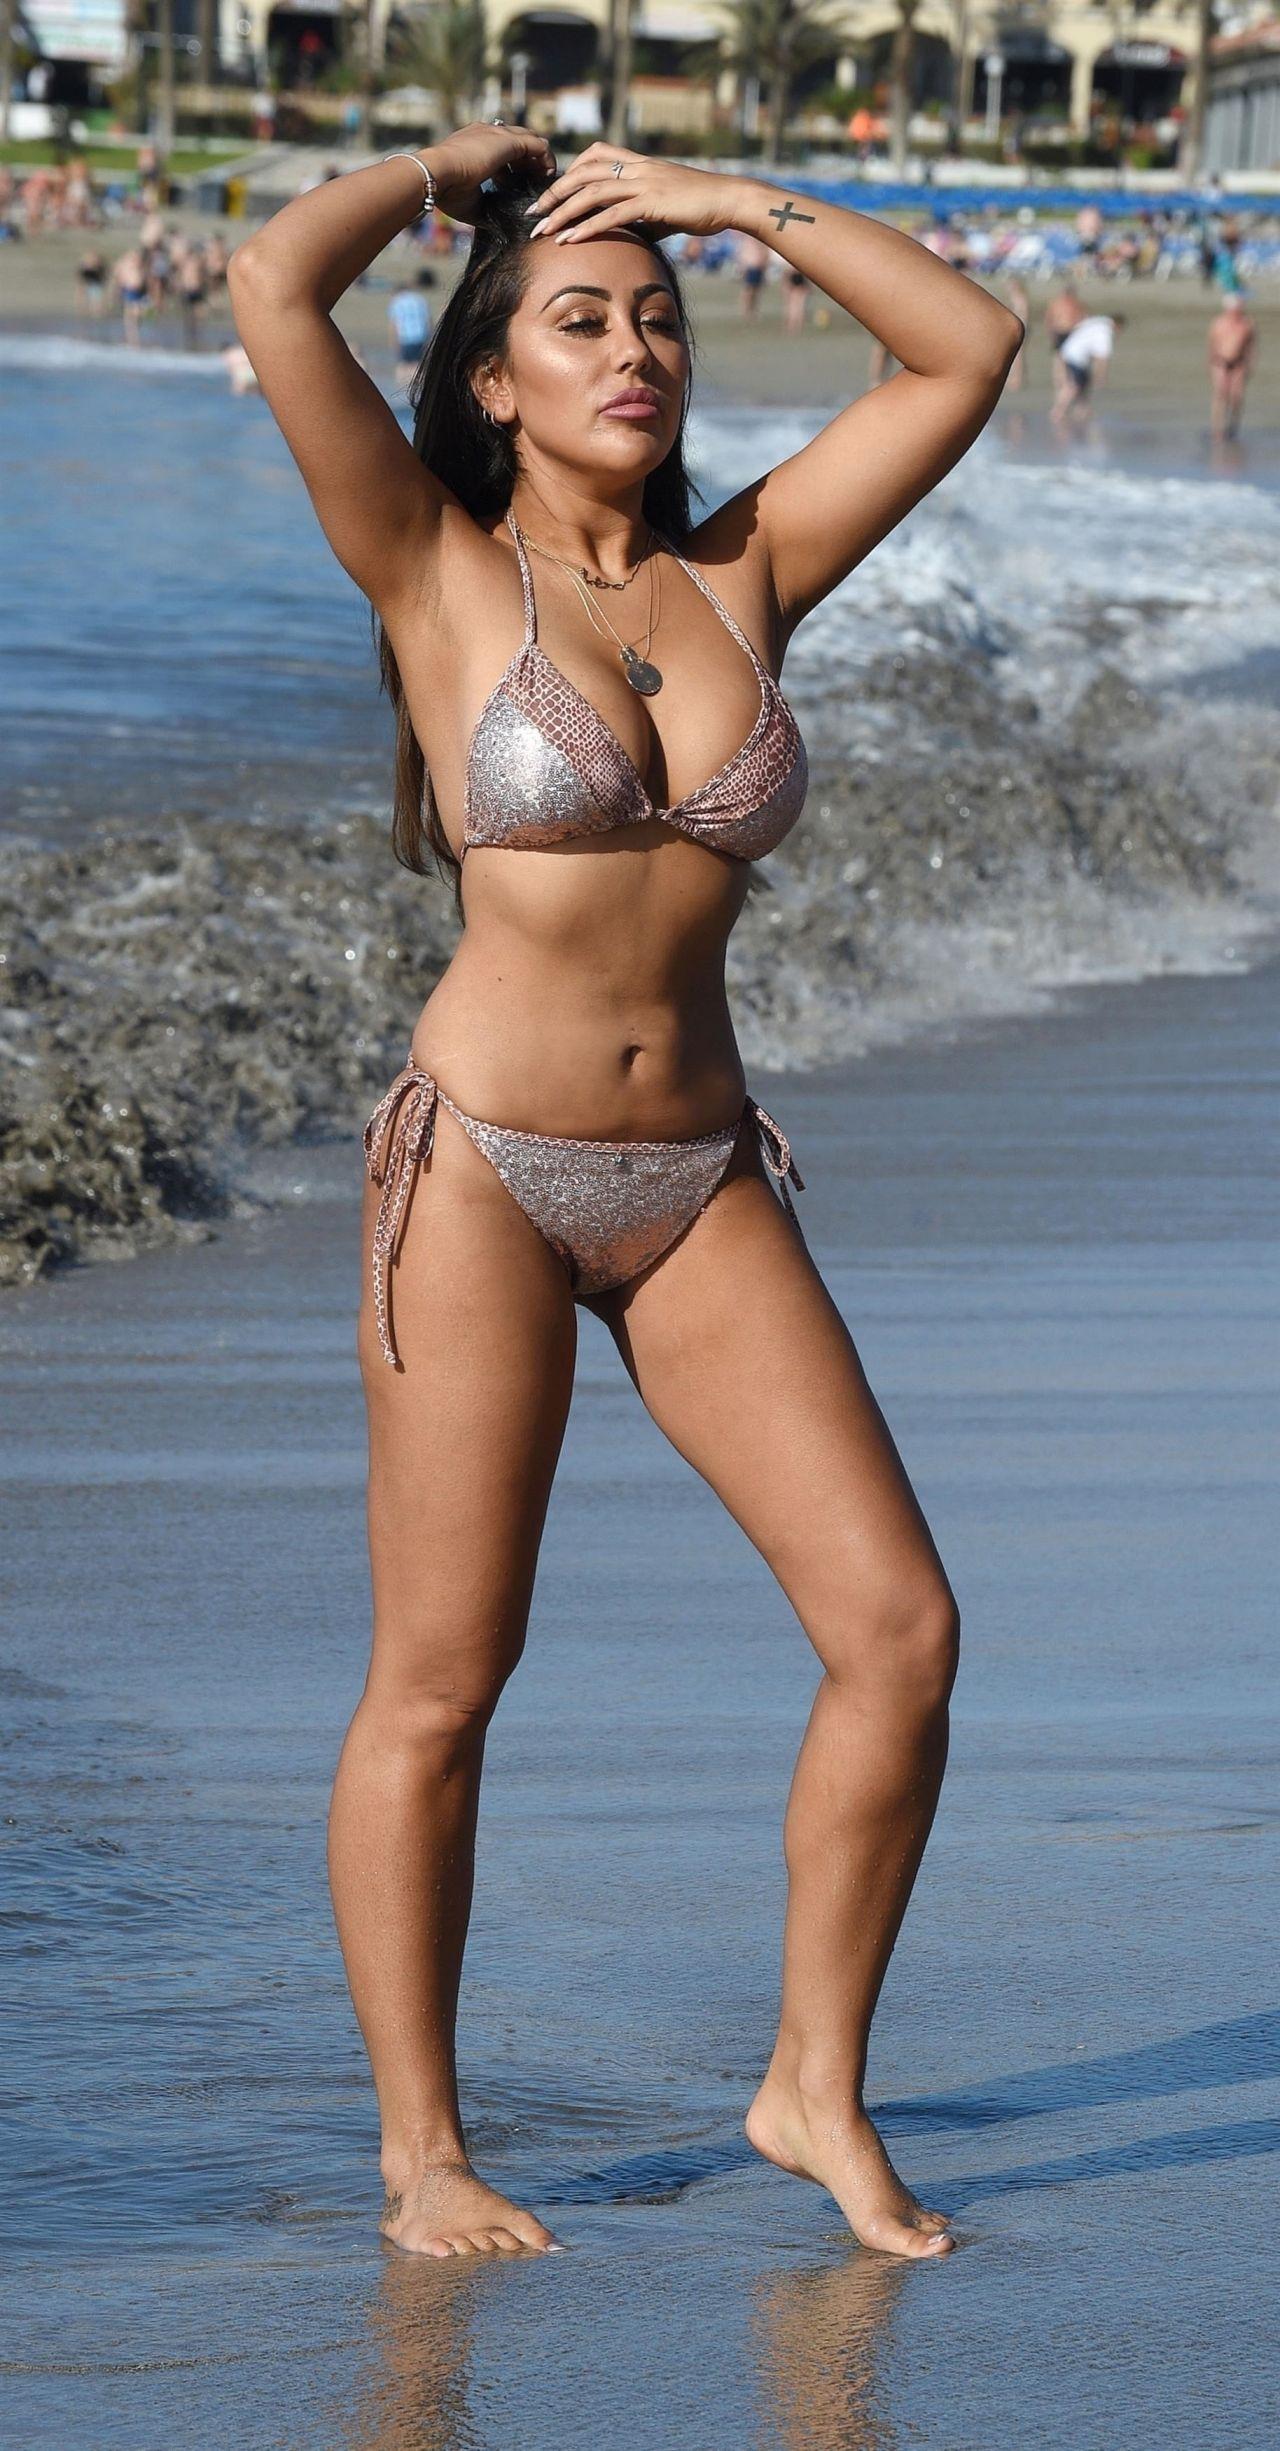 Sophie Kasaei in Bikini on the beach in Turkey Pic 9 of 35